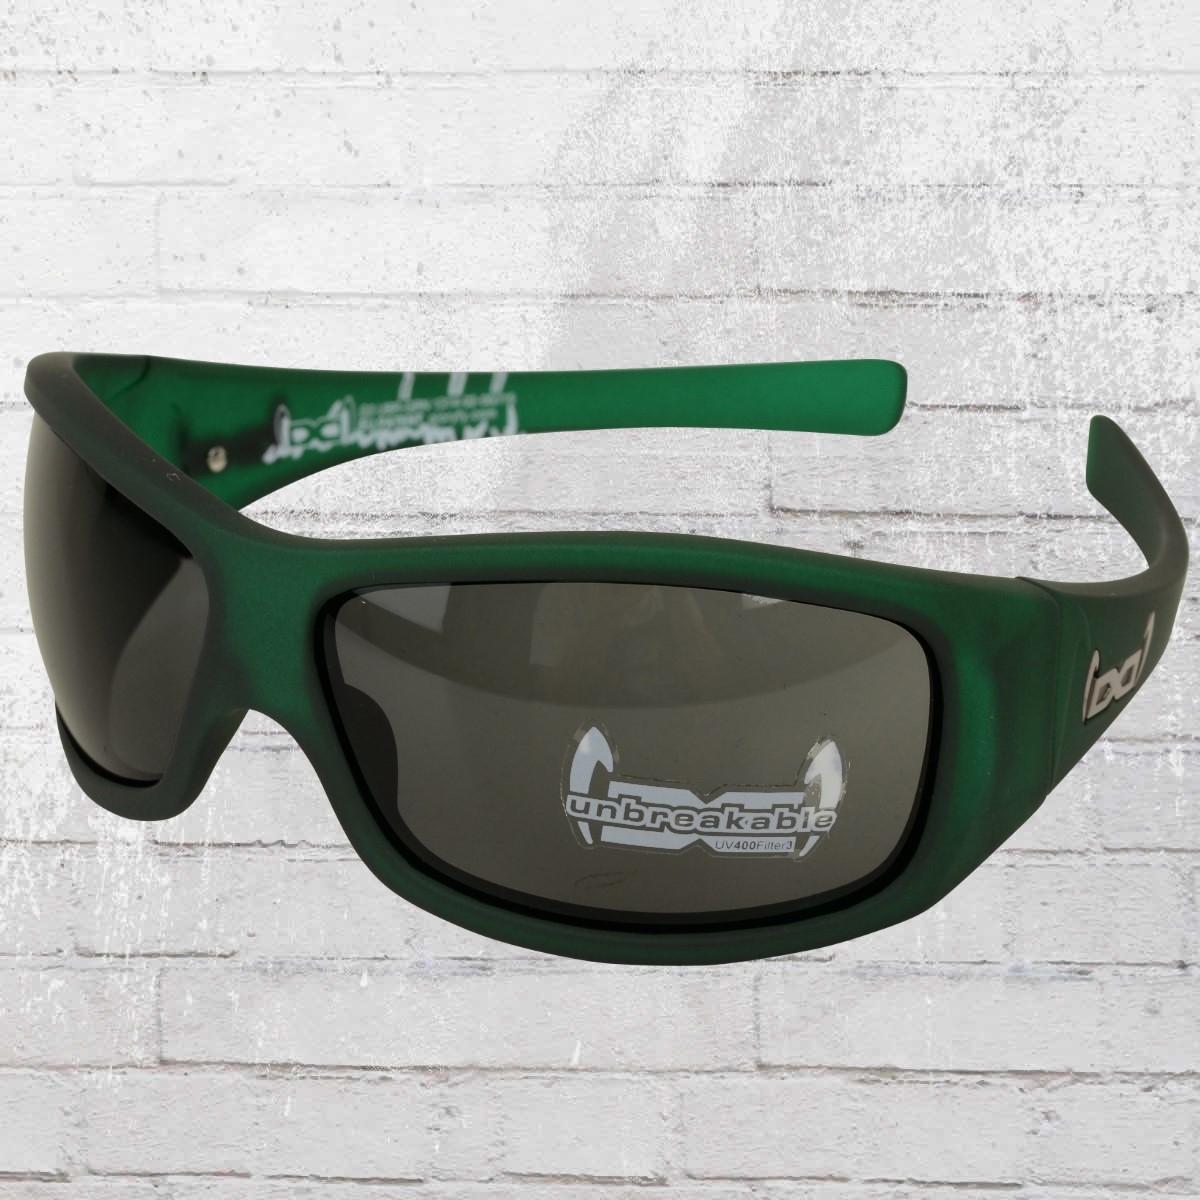 Gloryfy Sonnenbrille G3 Unbreakable dunkelgrün transparent